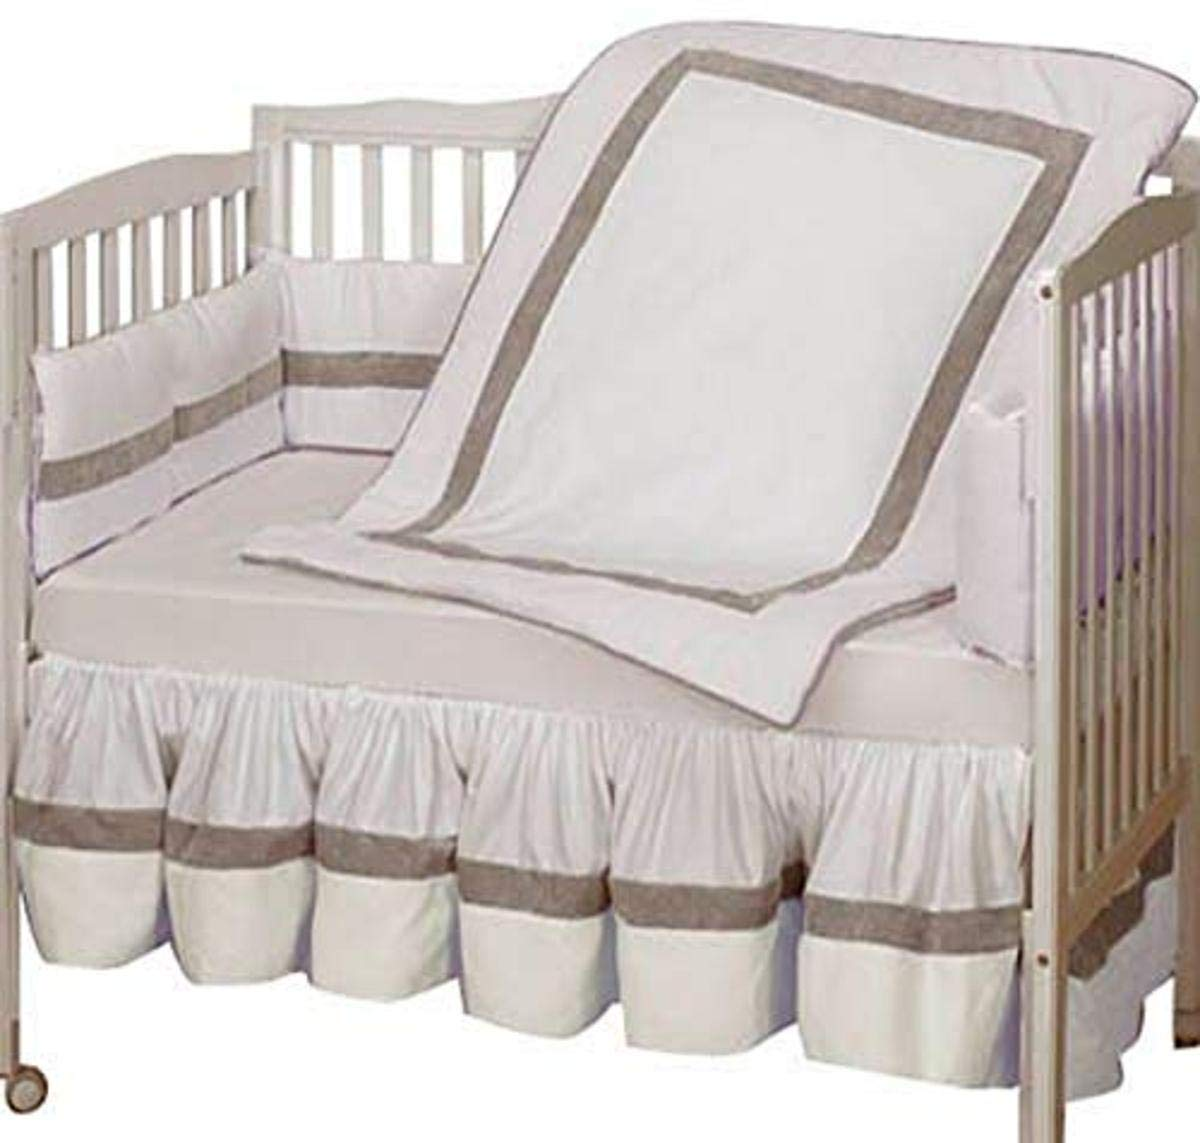 Baby Doll Bedding Classic II Crib Bedding Set, White